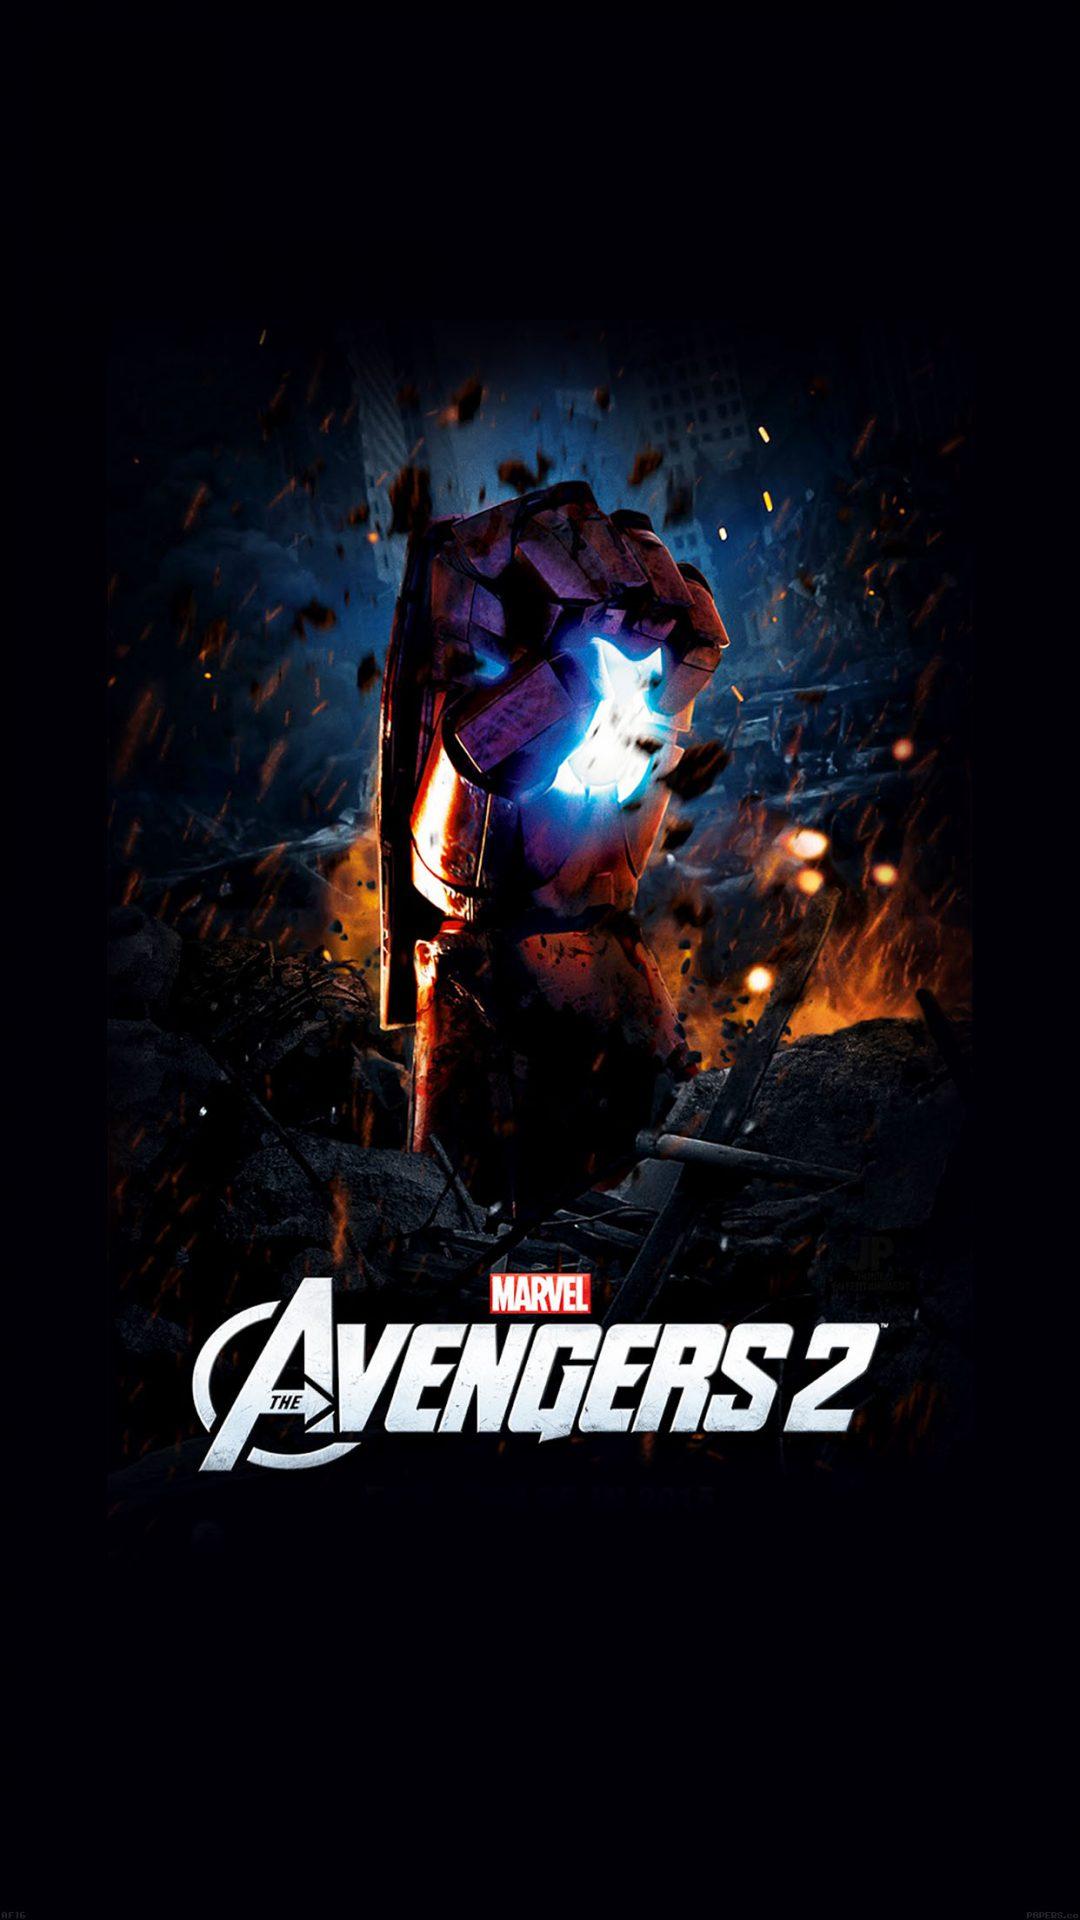 Avengers 2 Poster Hollywood Film Poster